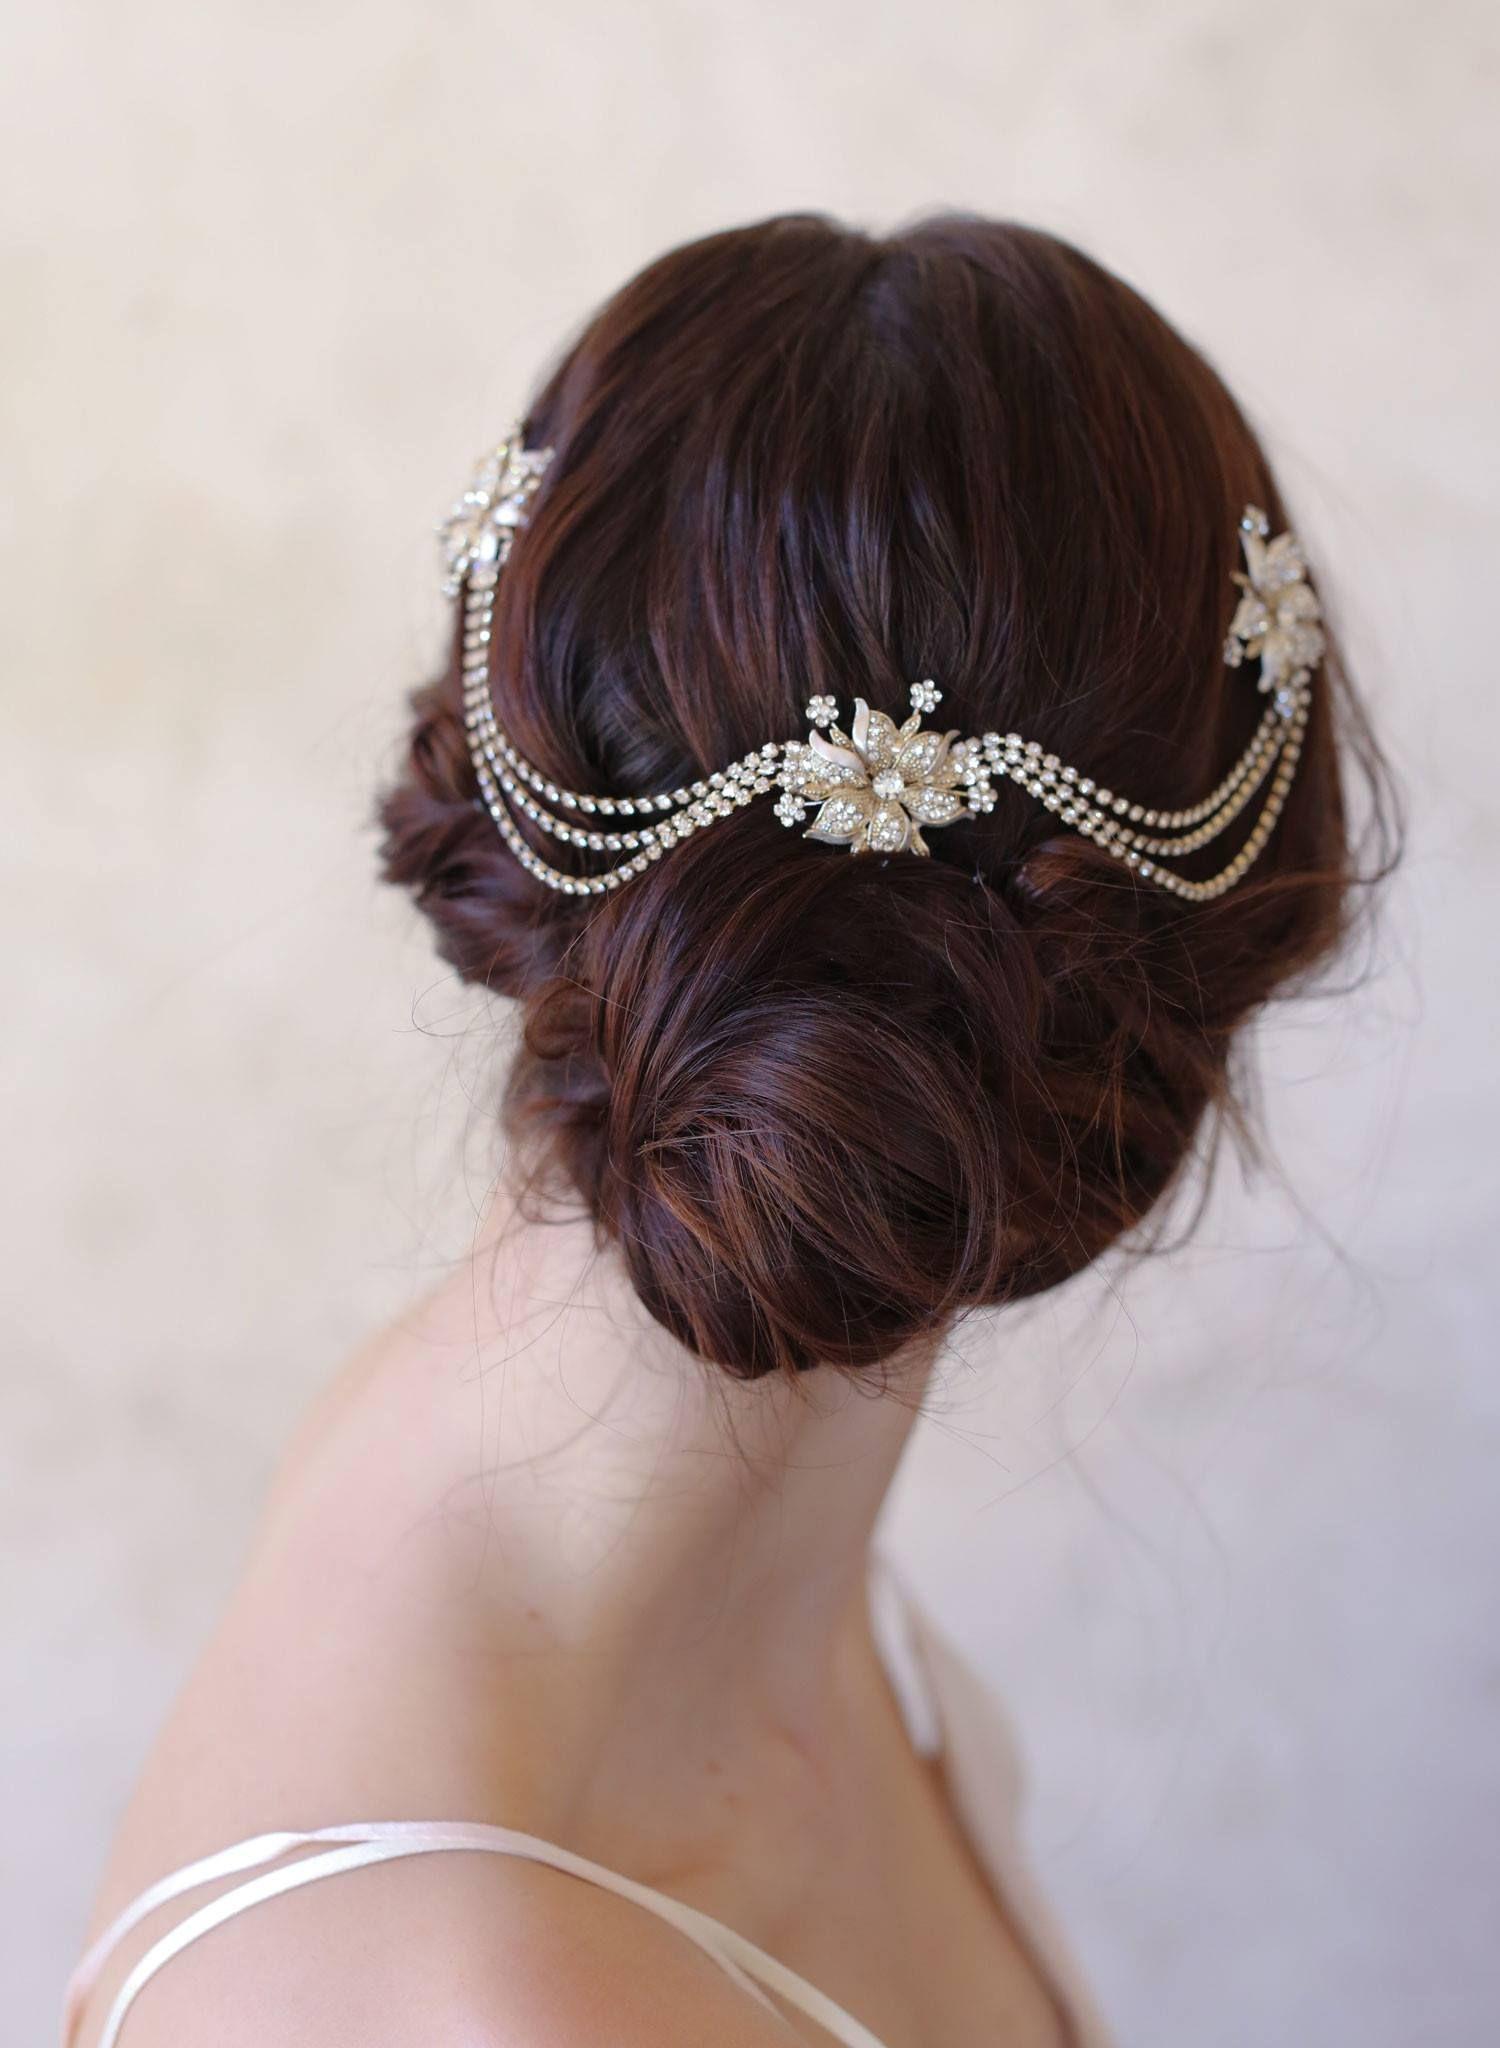 makeup.fever twigs & honey 514 hair adornments, headpieces, bridal